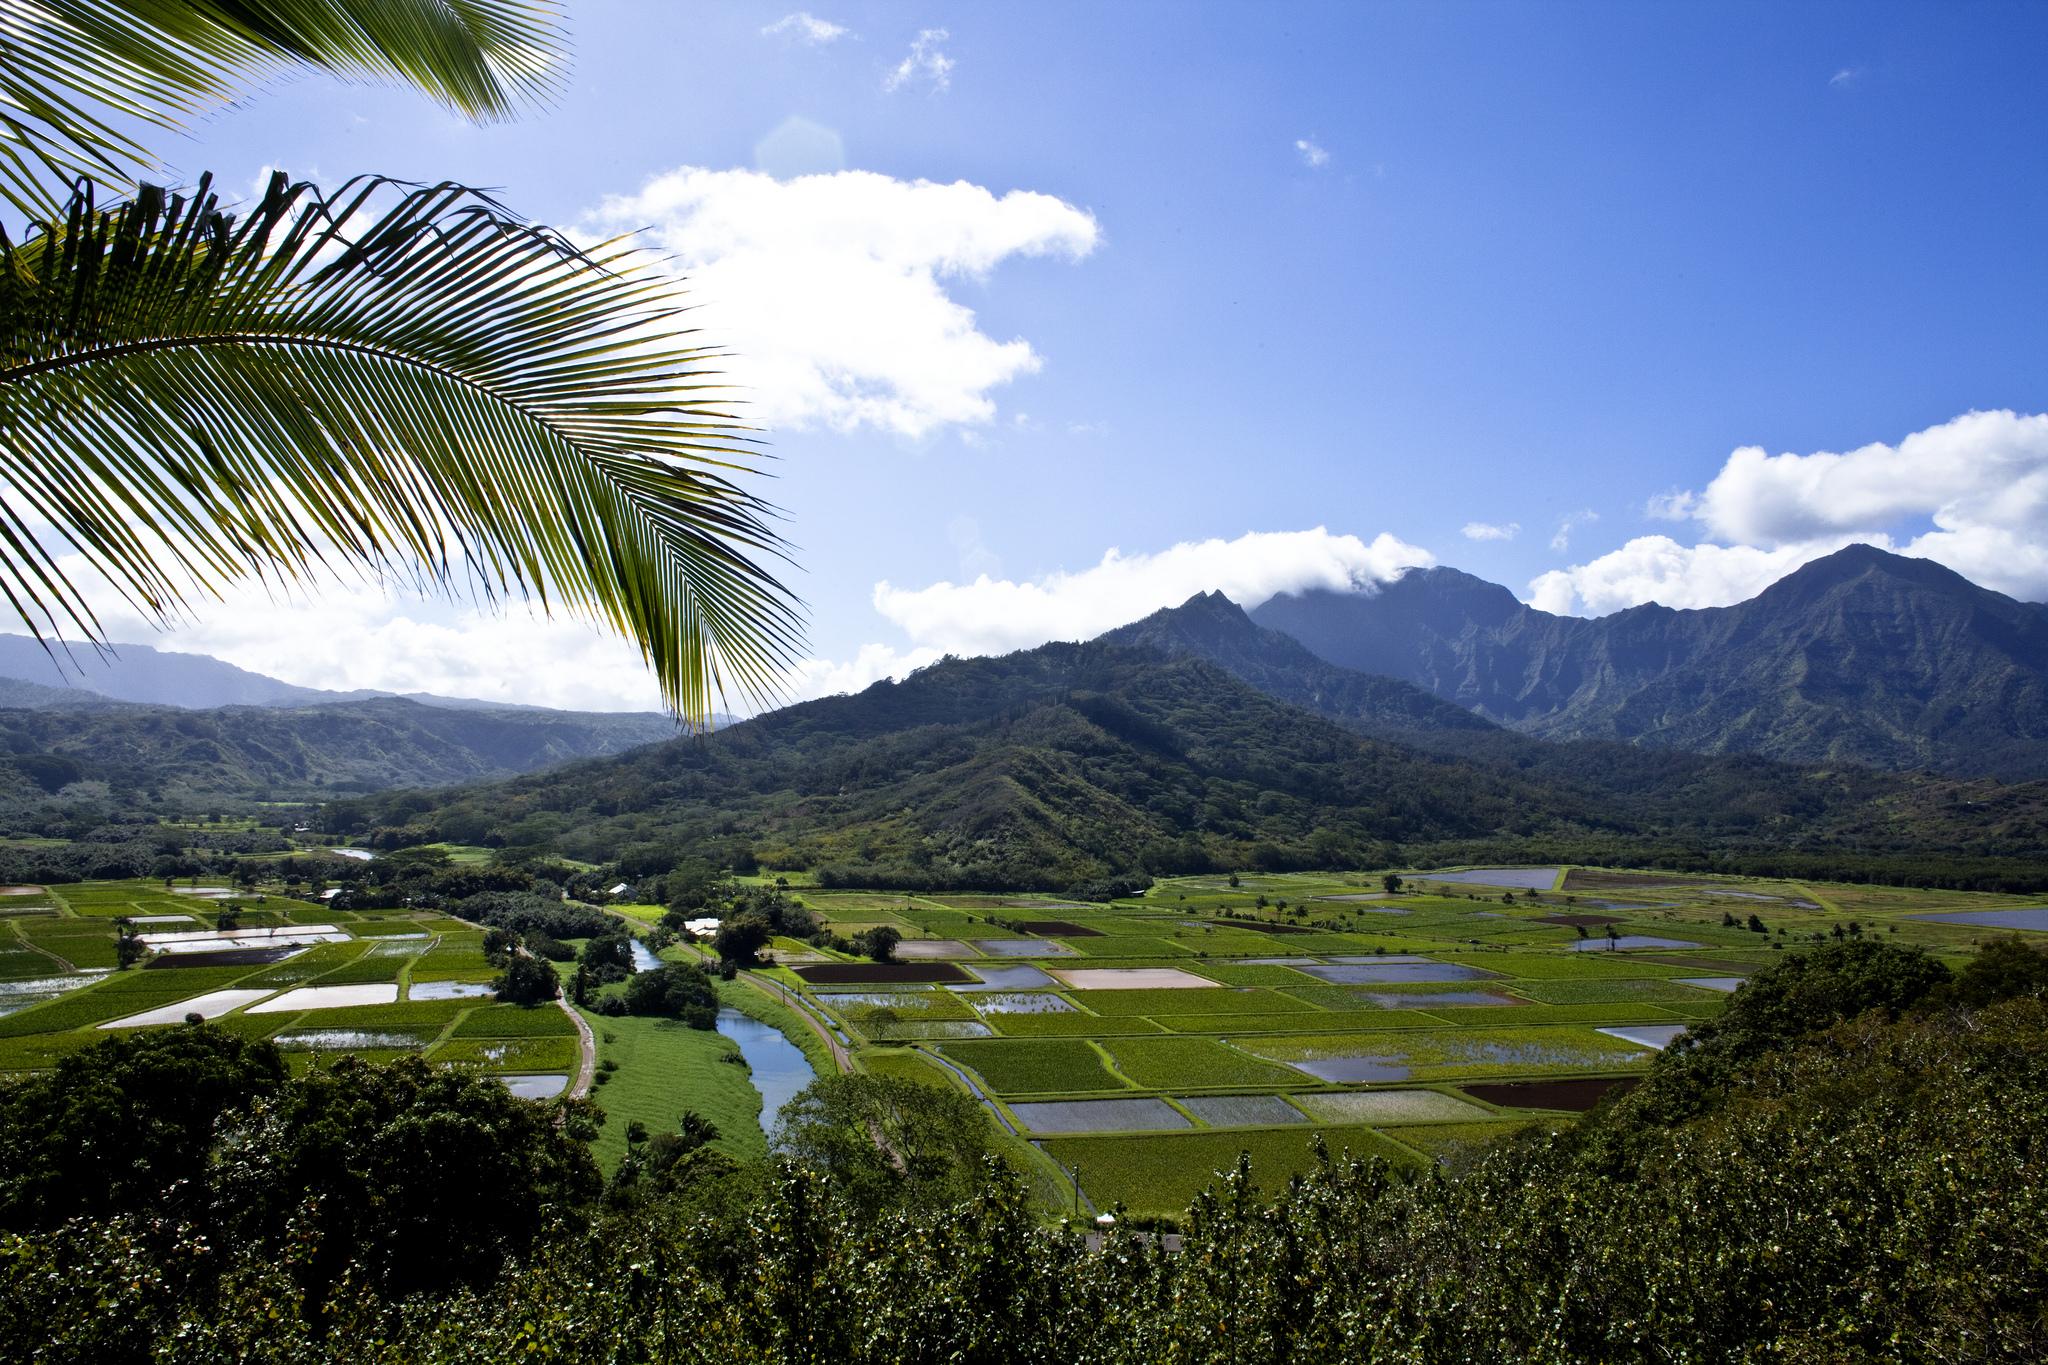 Kauai fields